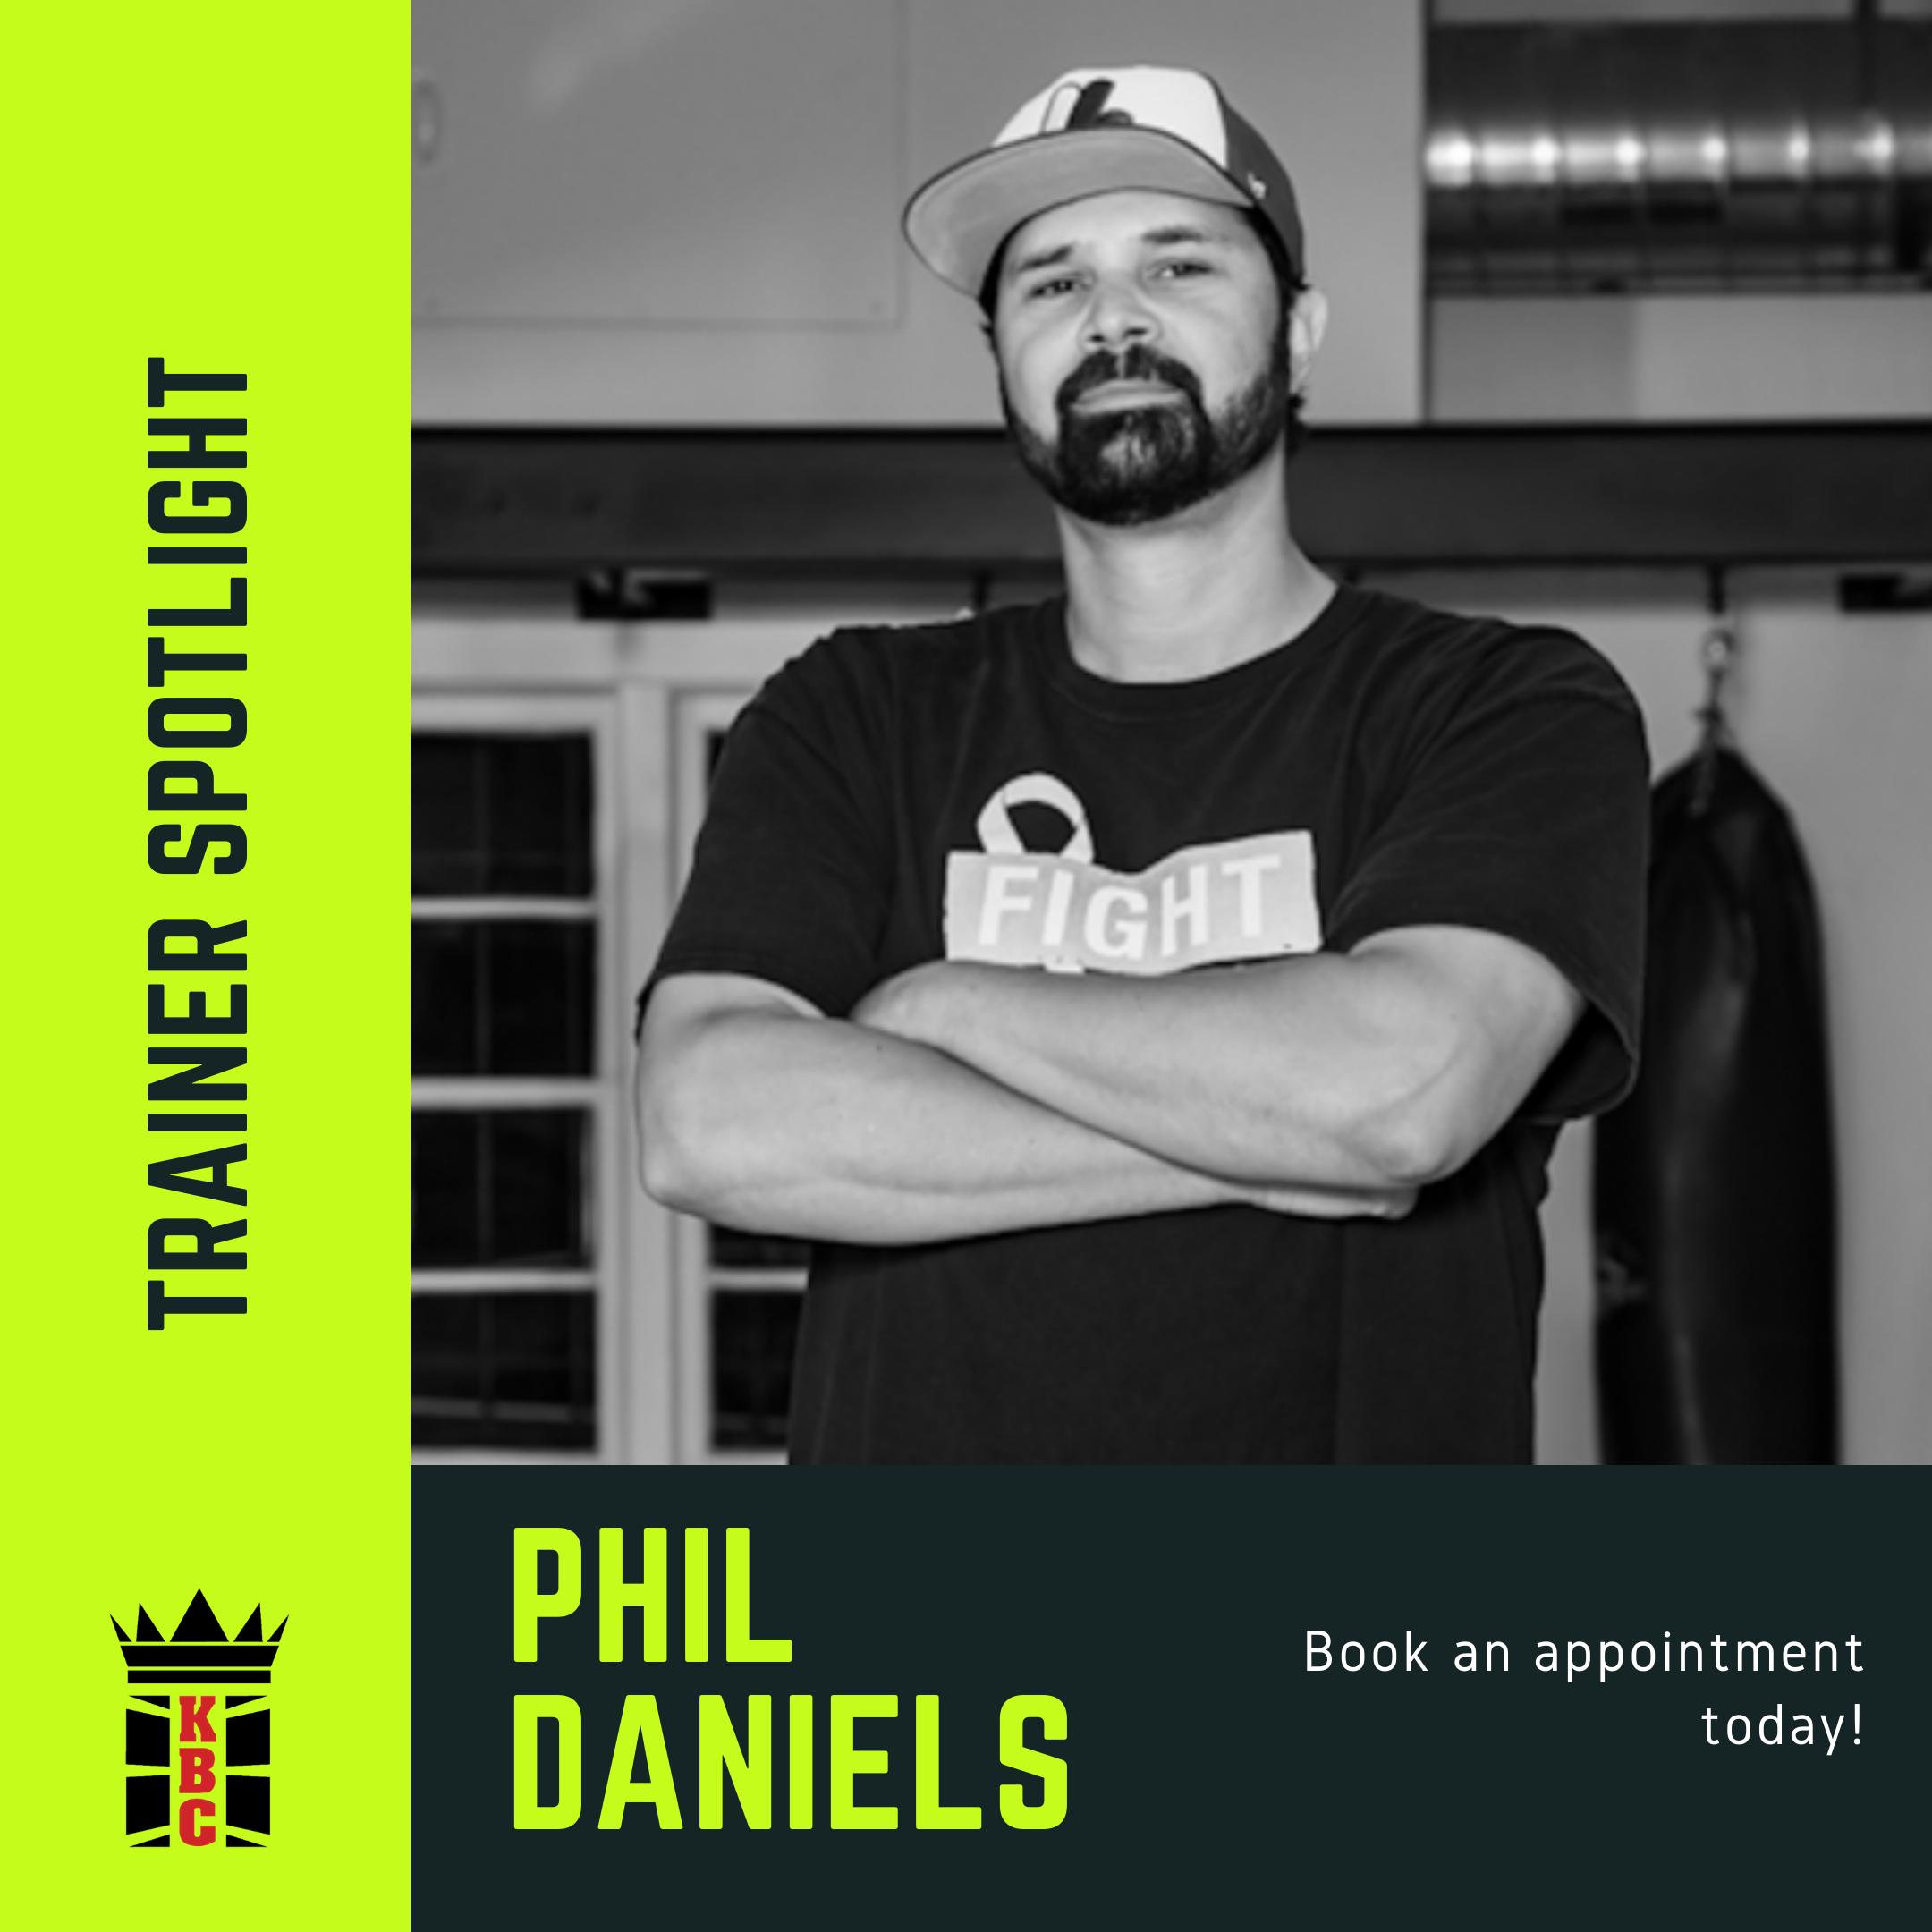 TRAINER SPOTLIGHT: Meet Phil Daniels!